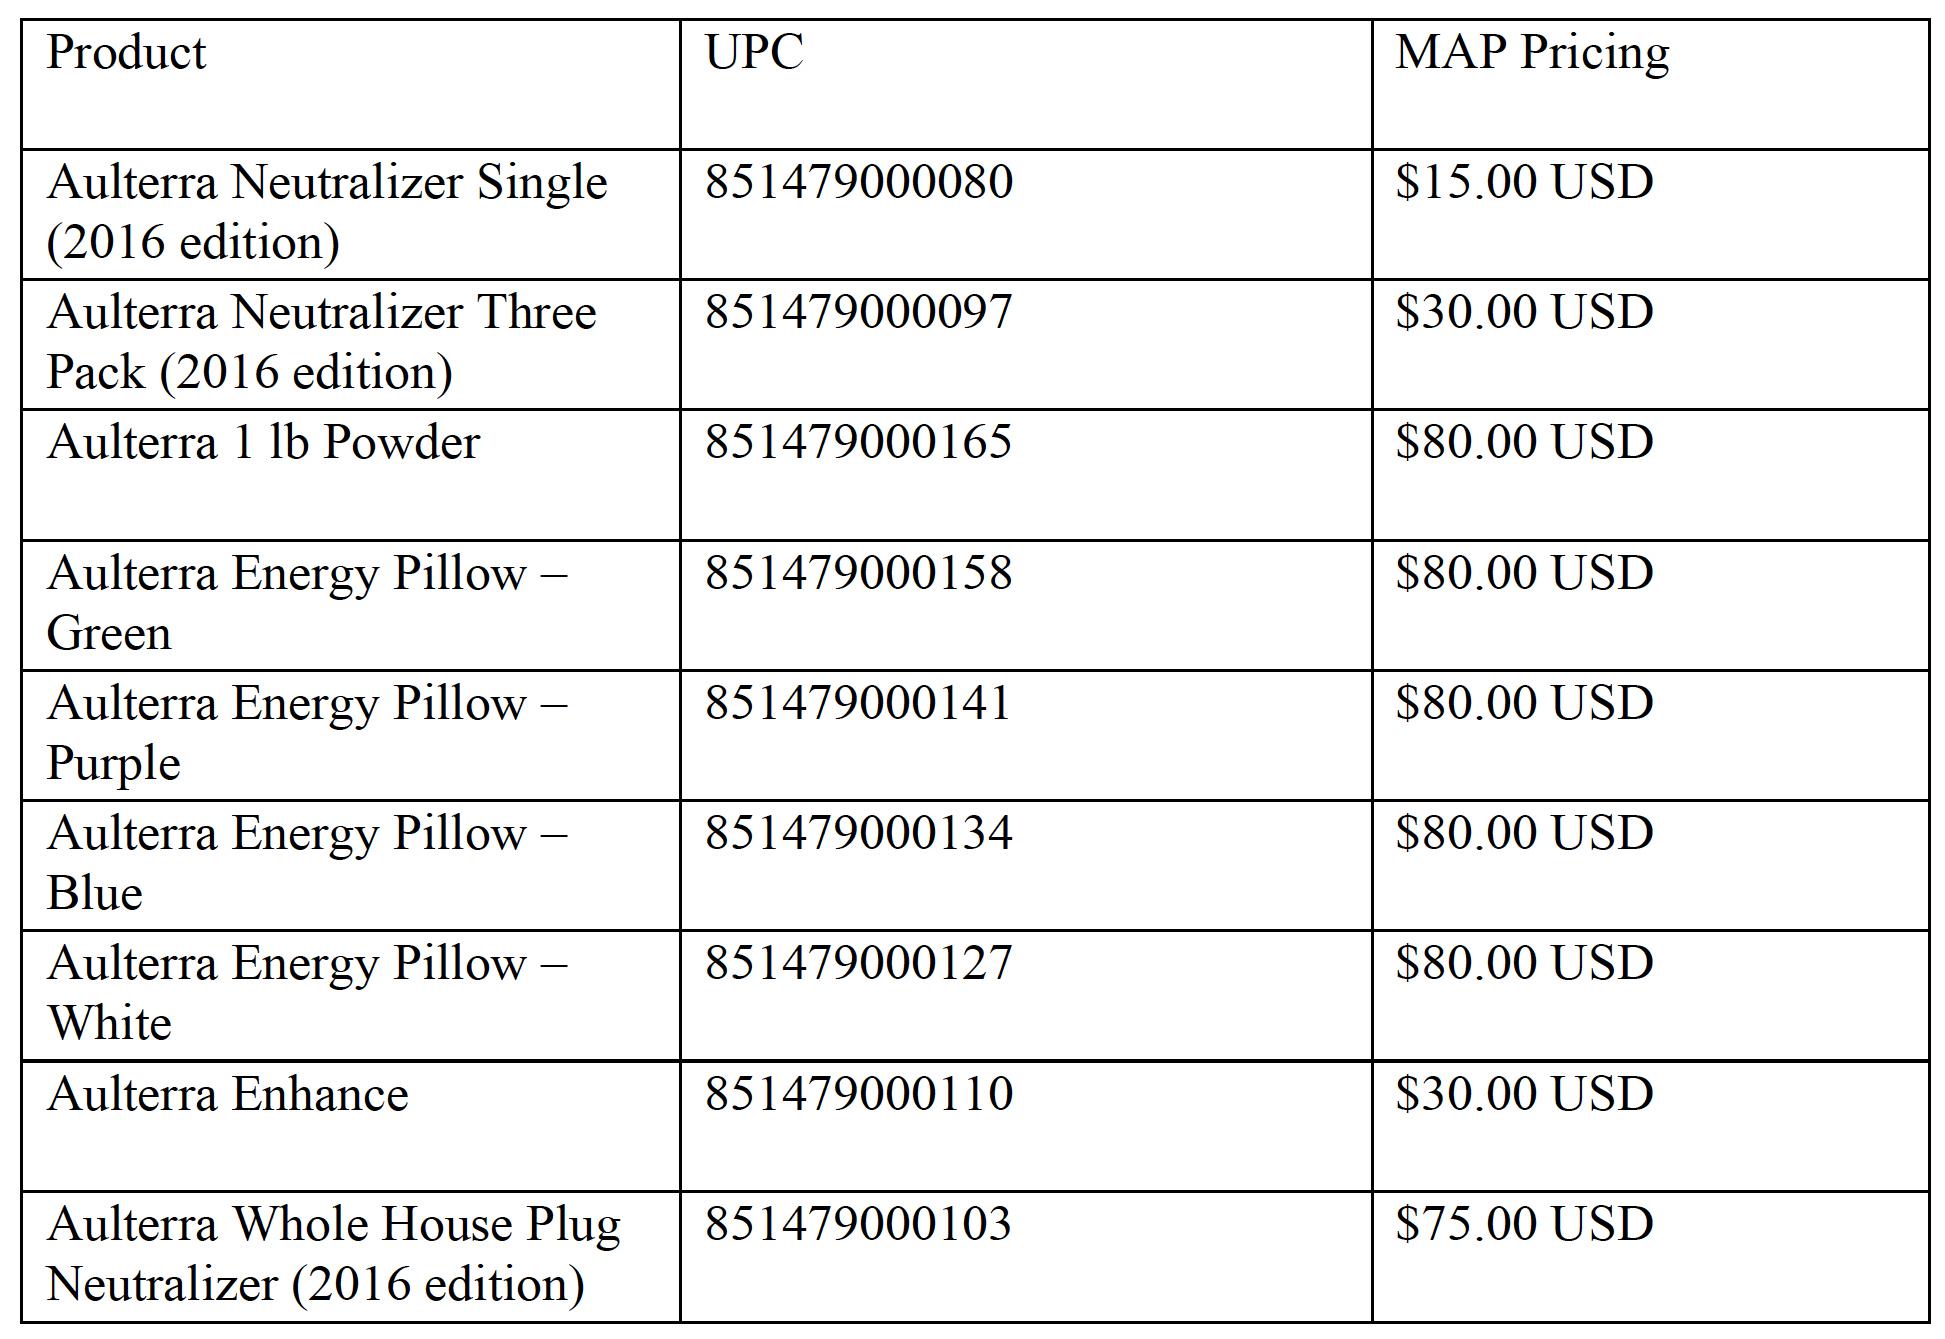 Aulterra-Product-Pricing.5ce449e4a50e74.90781201 Aulterra Premium Affiliate Map Agreement